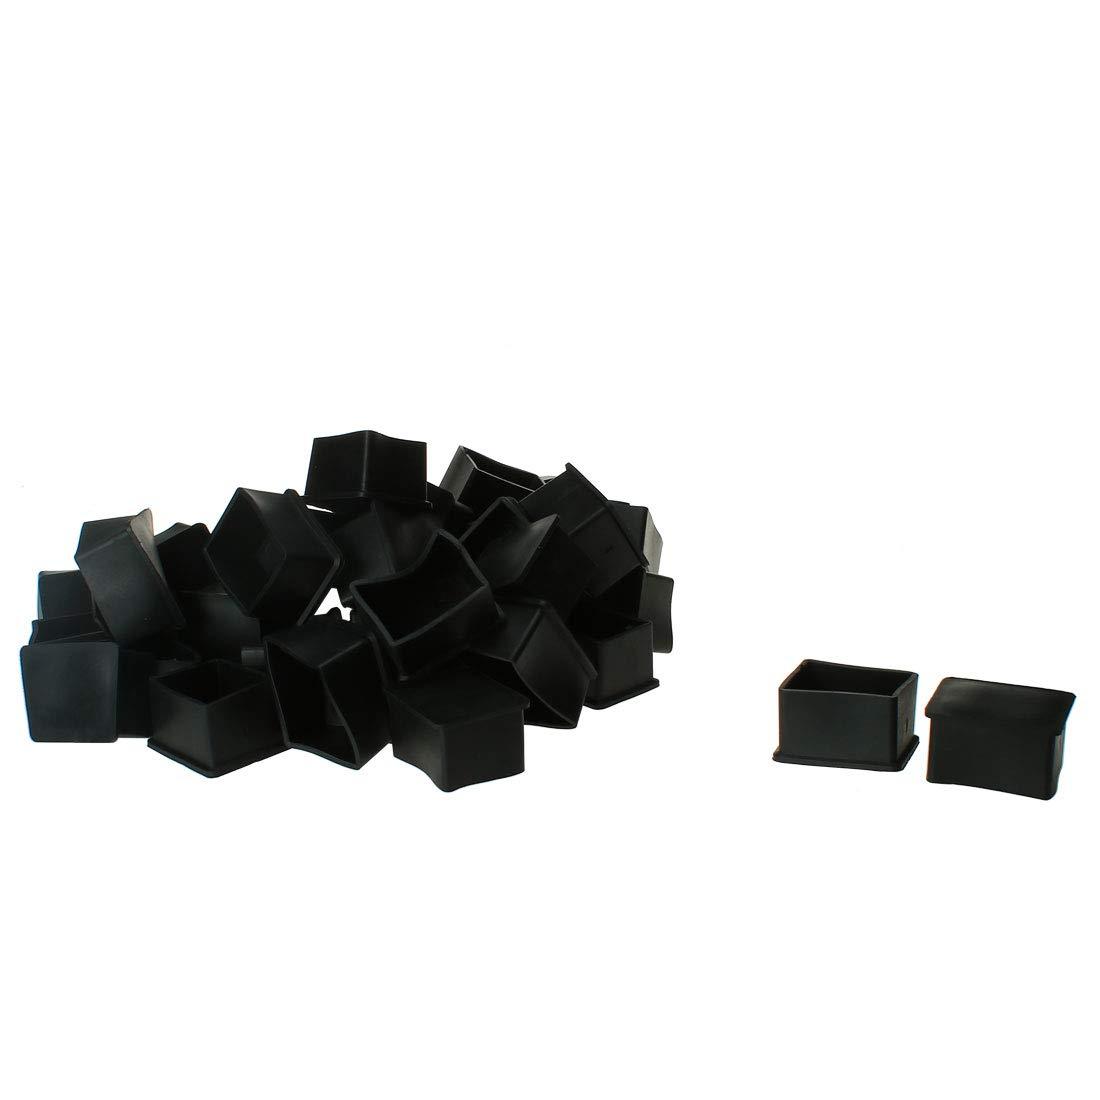 OKSLO Pvc leg caps tips feet cover 30x40mm 40pcs inner size prevent scratch for table